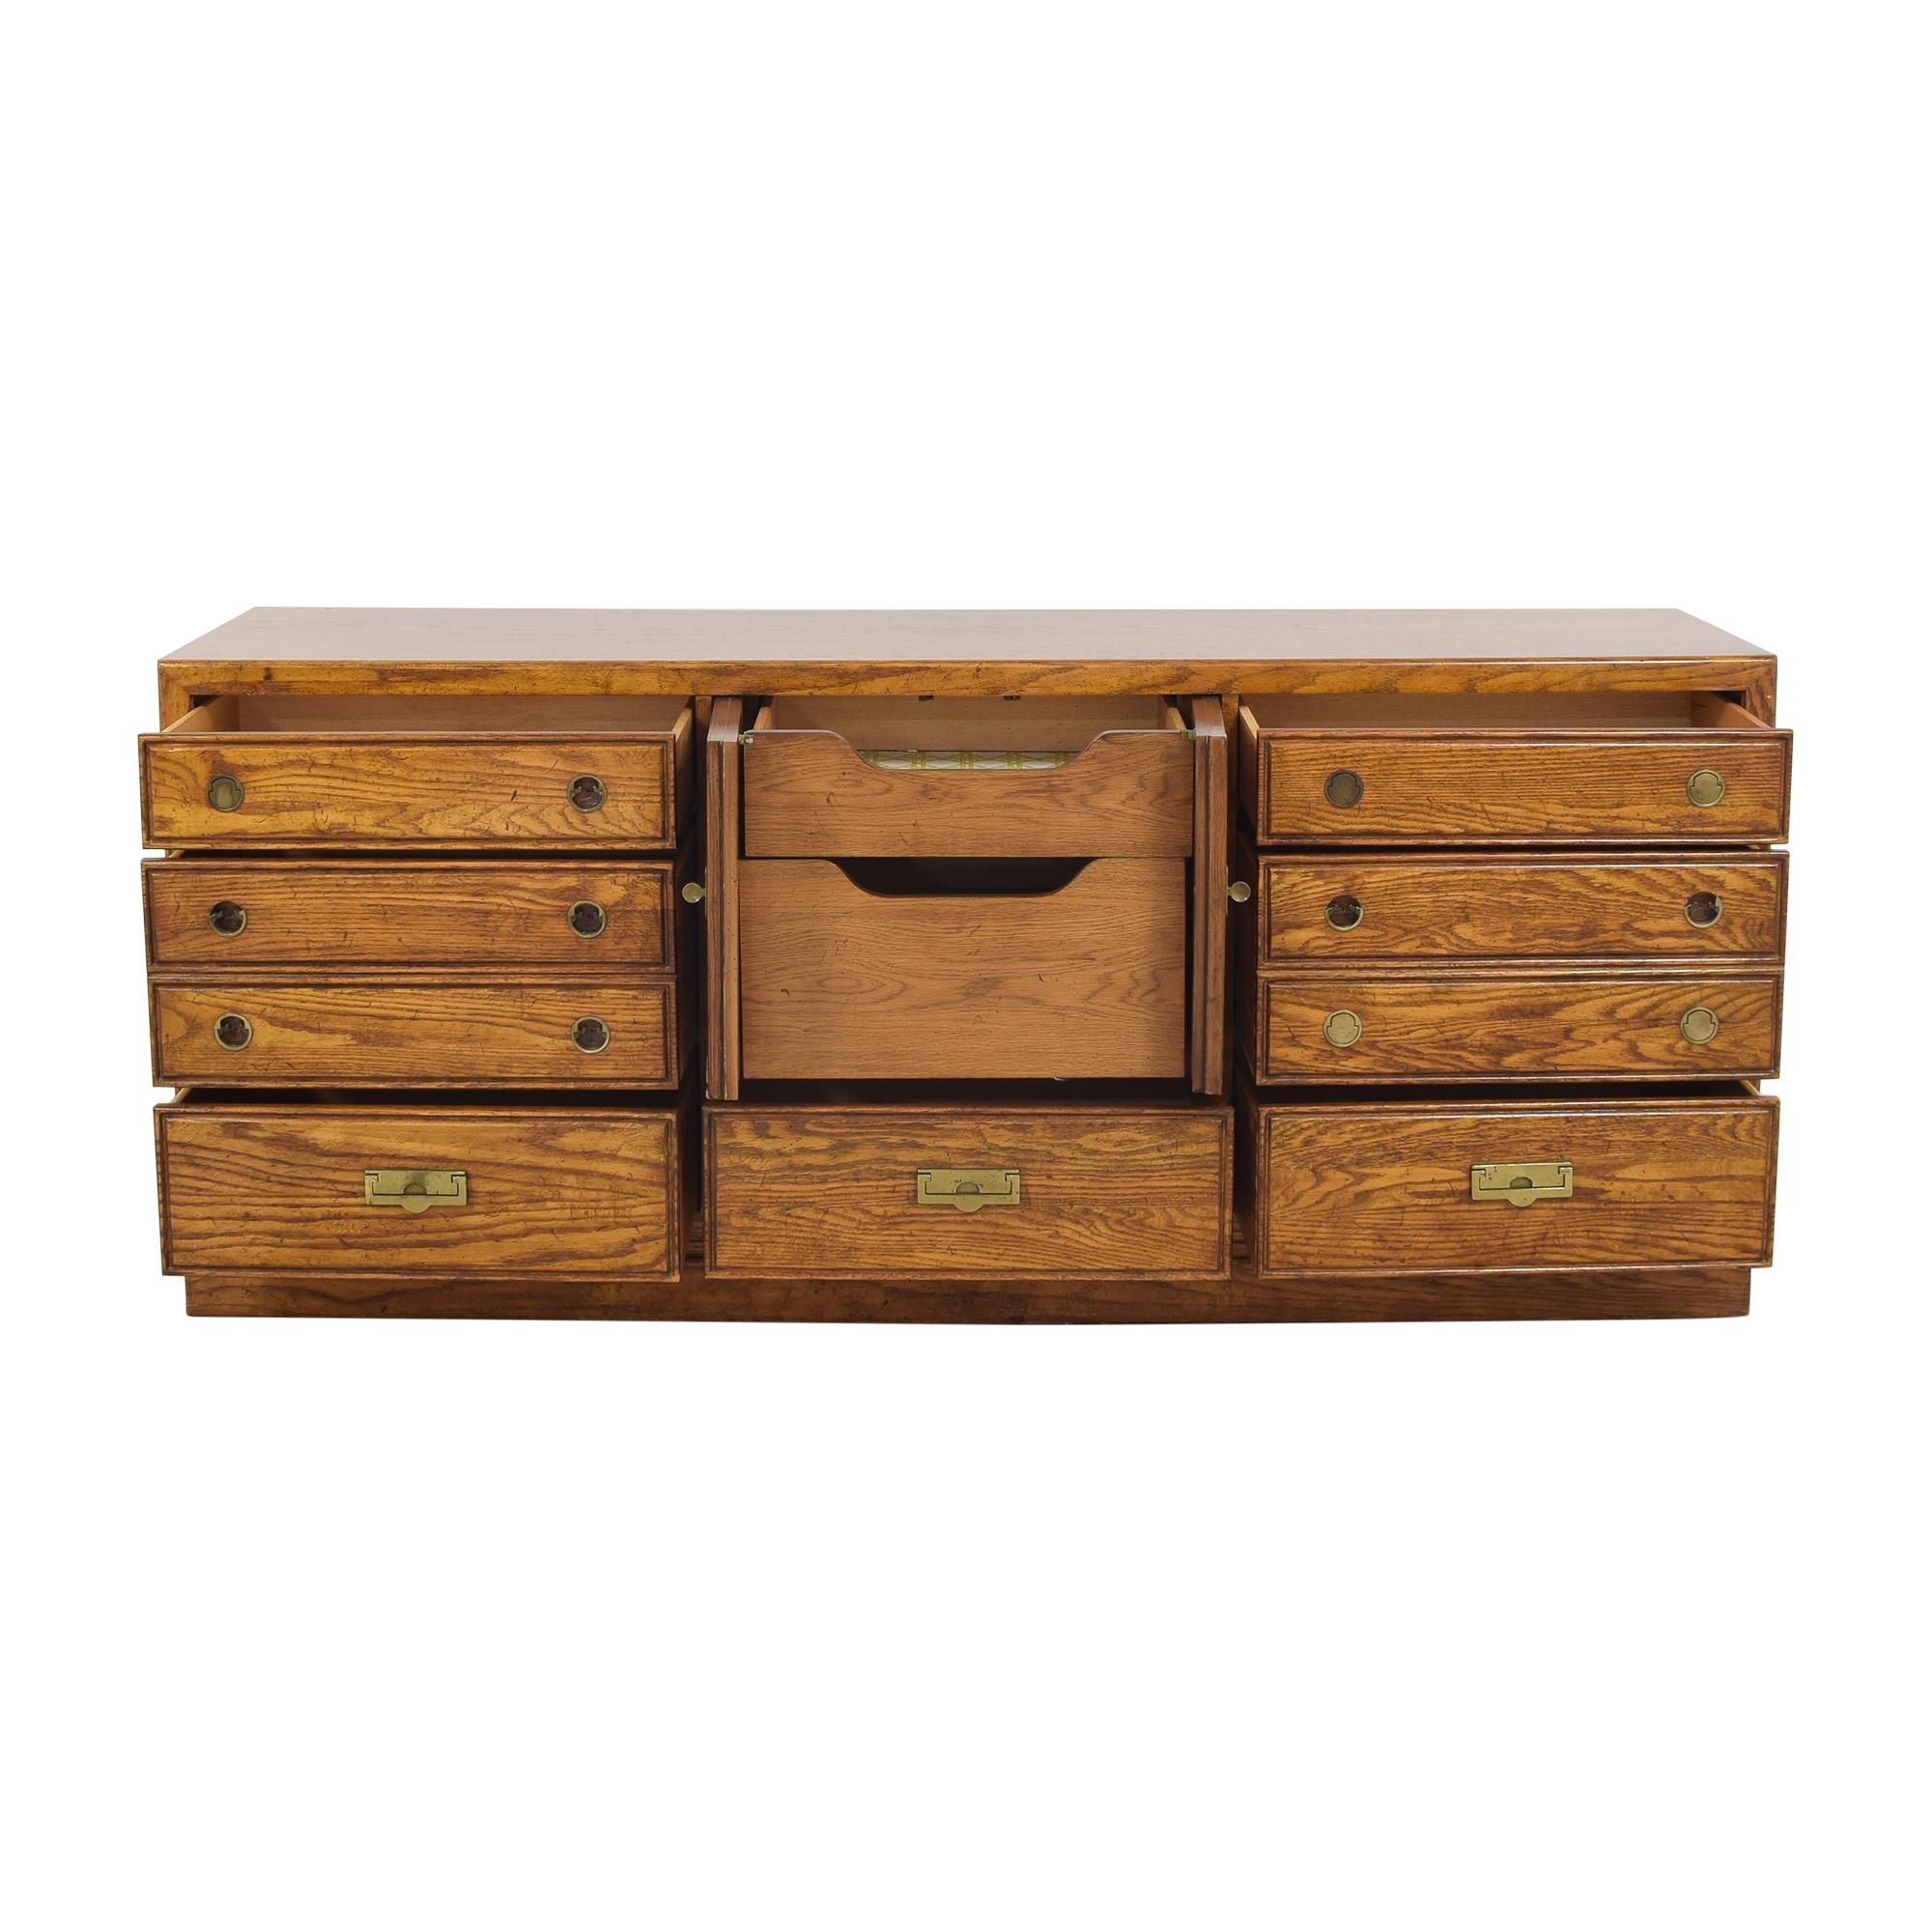 Thomasville Thomasville Vintage Dresser pa